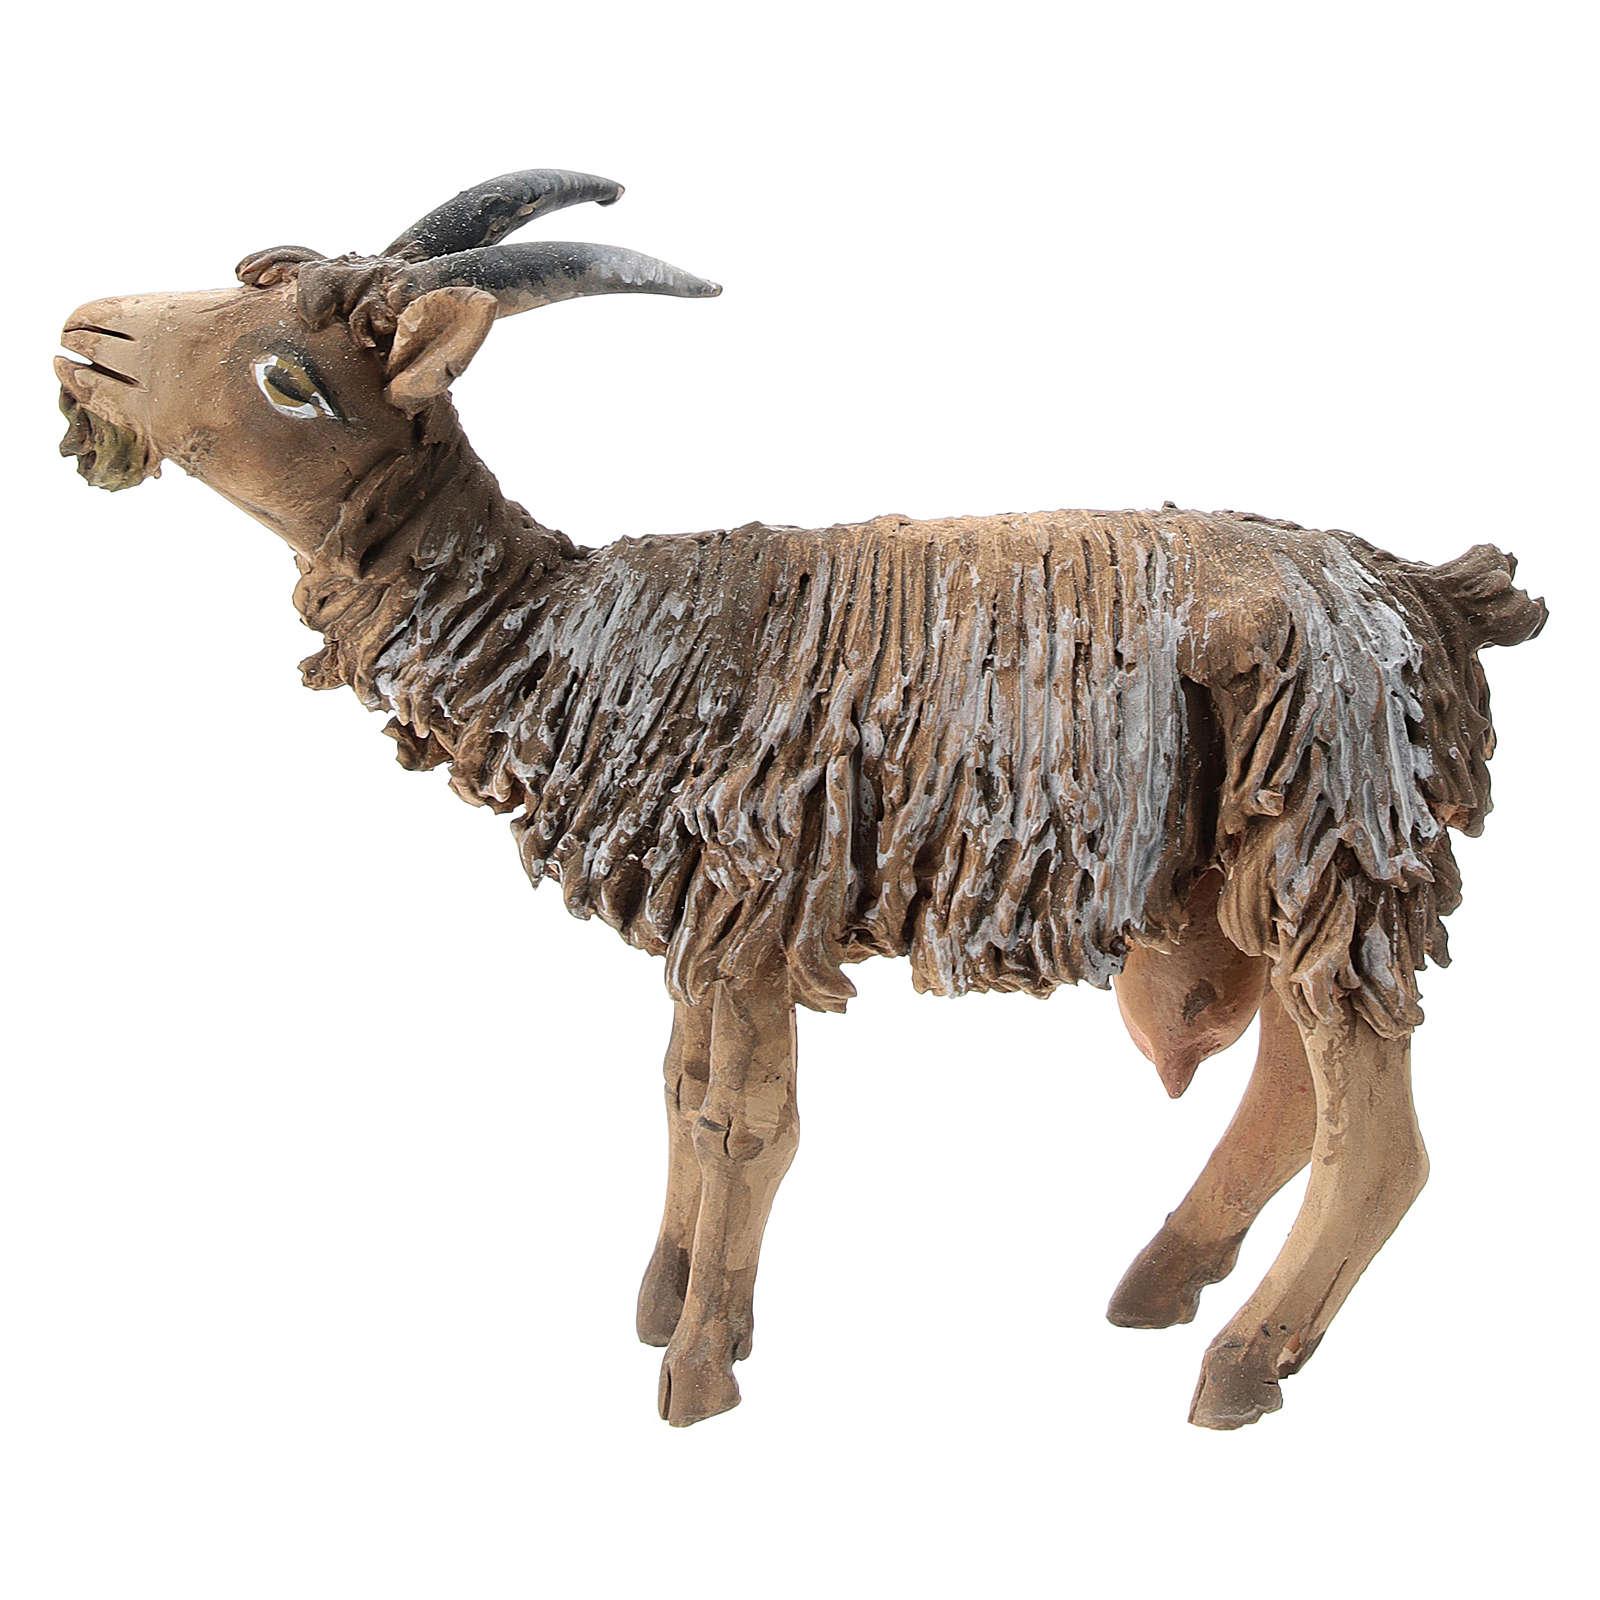 Chèvre terre cuite 13 cm Angela Tripi 4